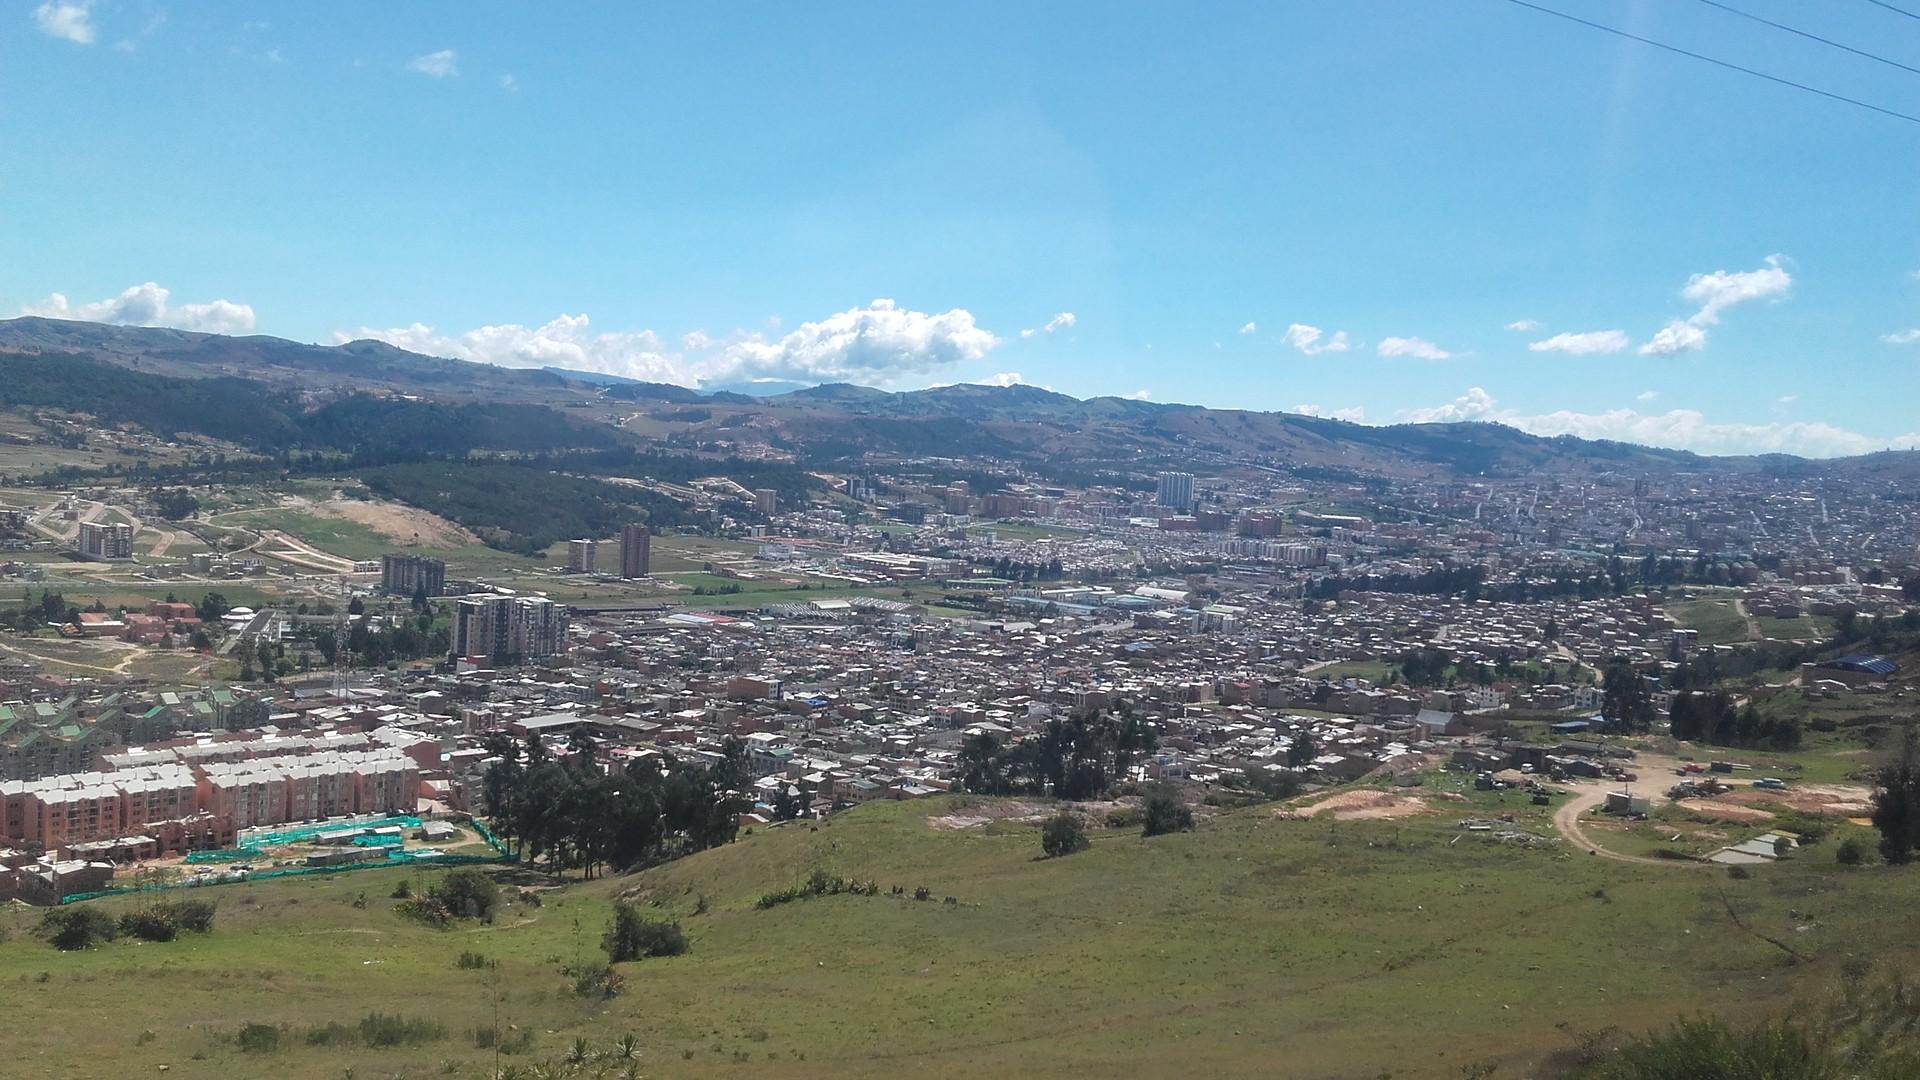 Esperienza a Tunja, Colombia di Leidy